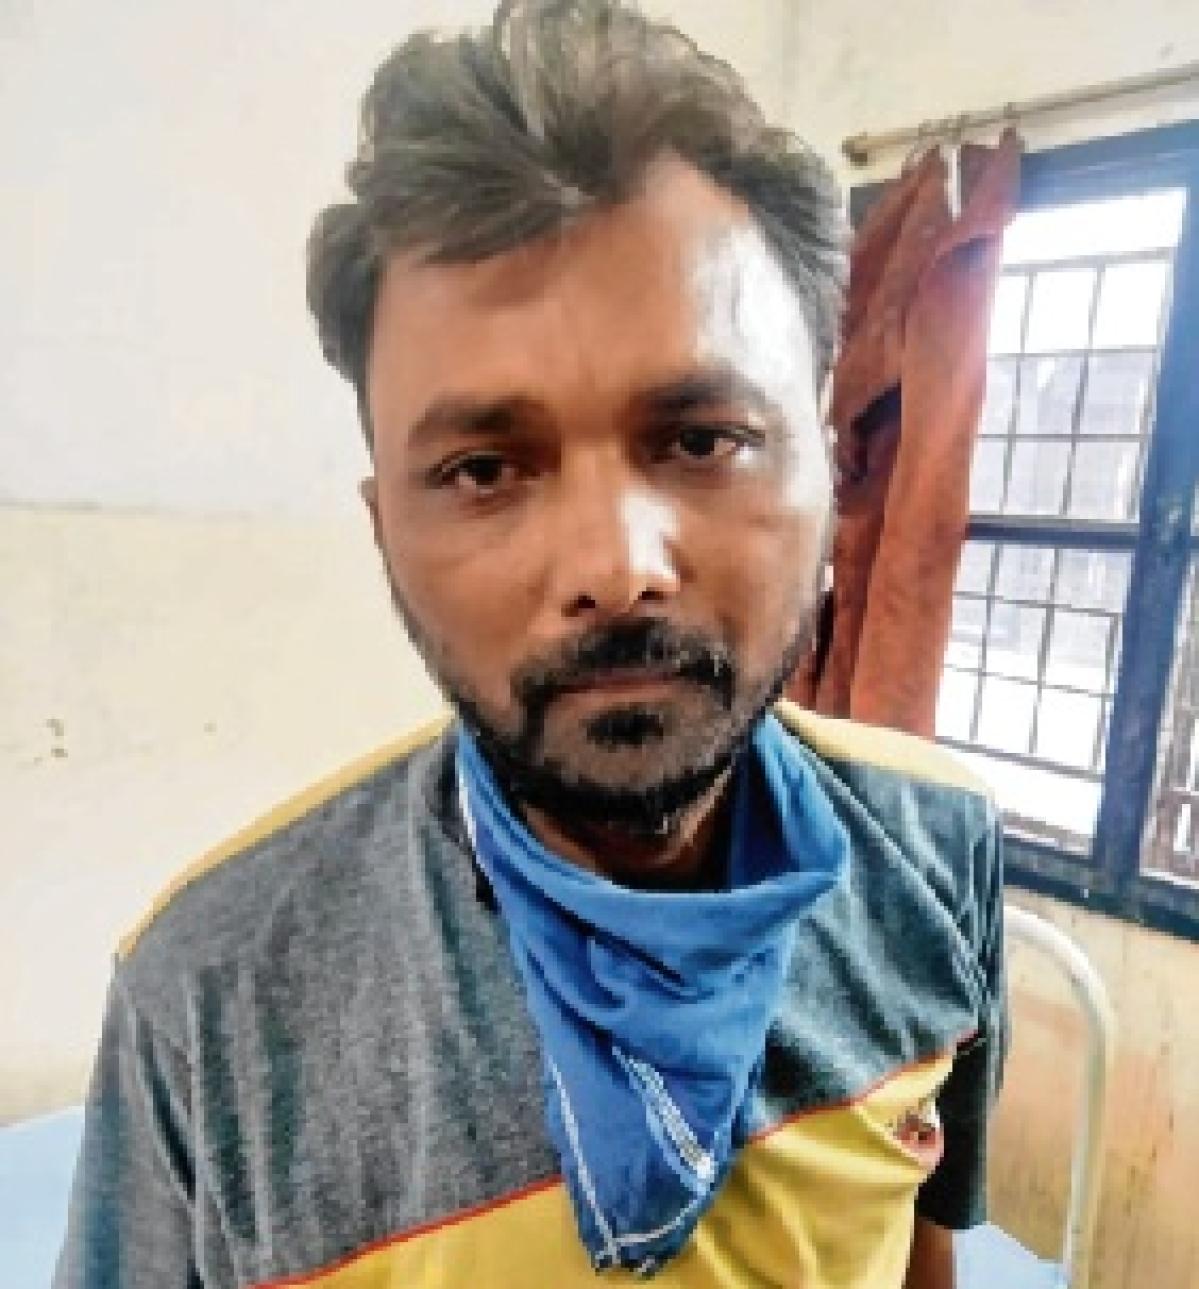 Gujarat cops thrash 3 Dalits, land in soup